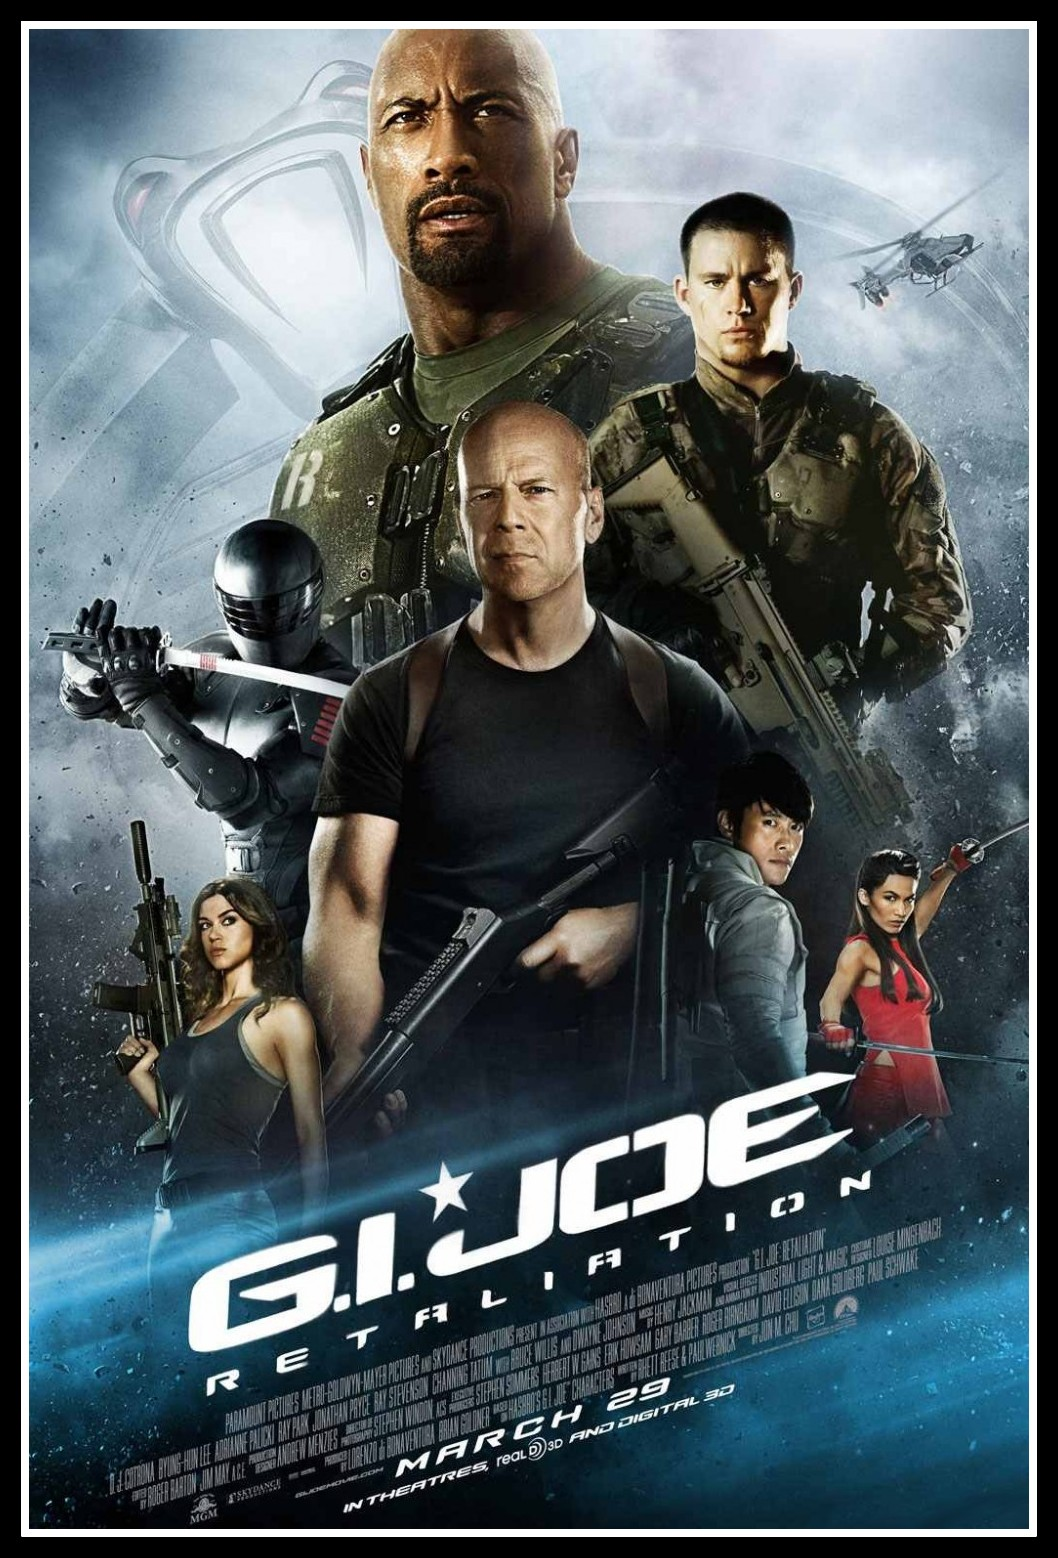 http://1.bp.blogspot.com/-IJoBlyfPBb4/UUiNIMm4KpI/AAAAAAAAB6I/5toYDDKhwbA/s1600/g+i+joe+retaliation+movie+poster+01.jpg